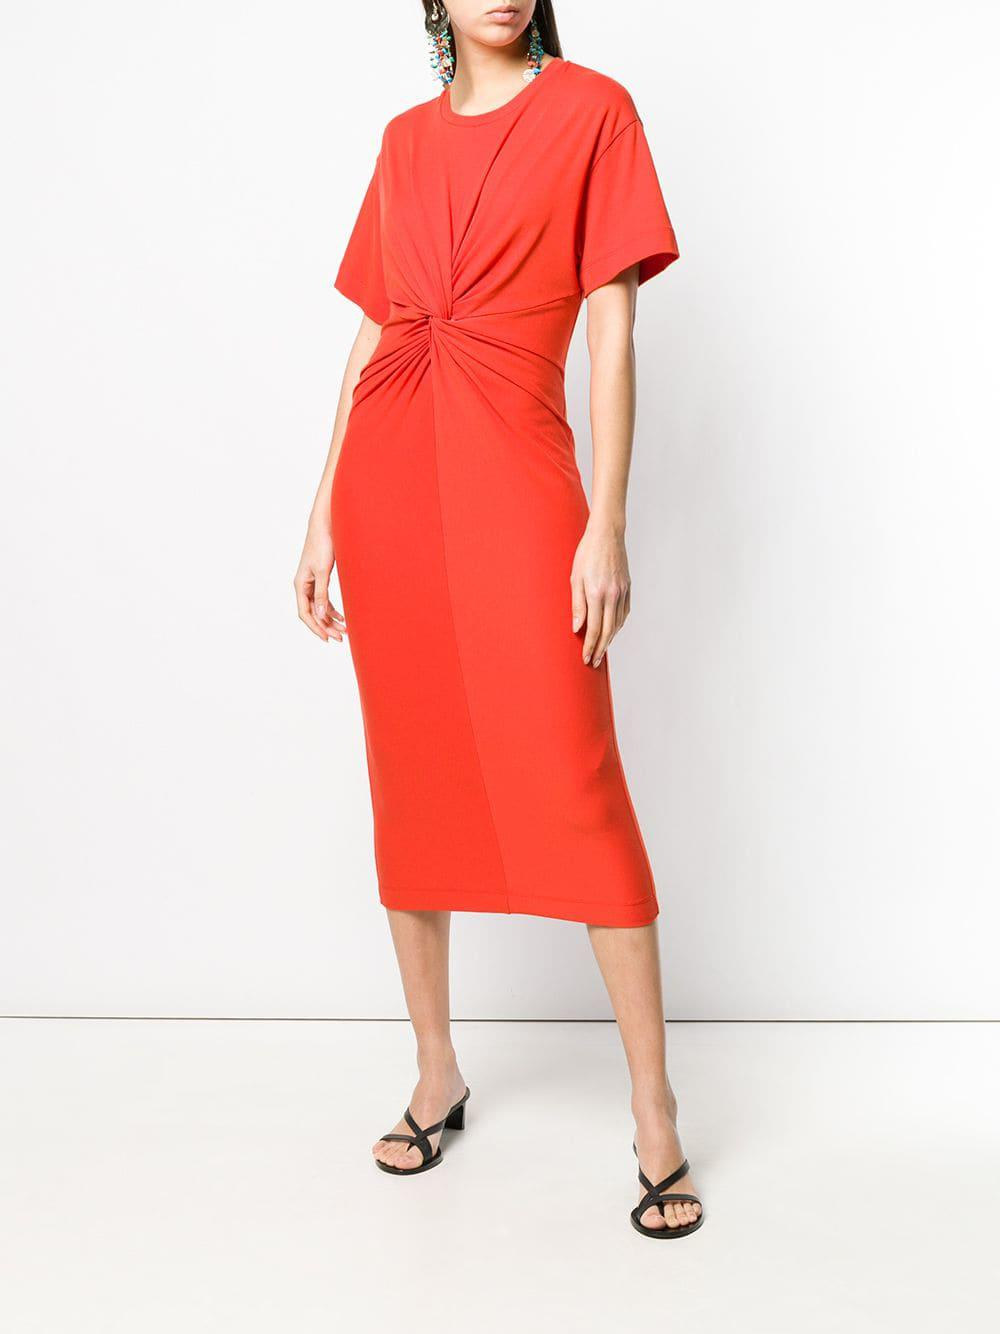 dbb92f36fea7 Erika Cavallini Semi Couture Dafne Cotton Dress in Orange - Save 1% - Lyst